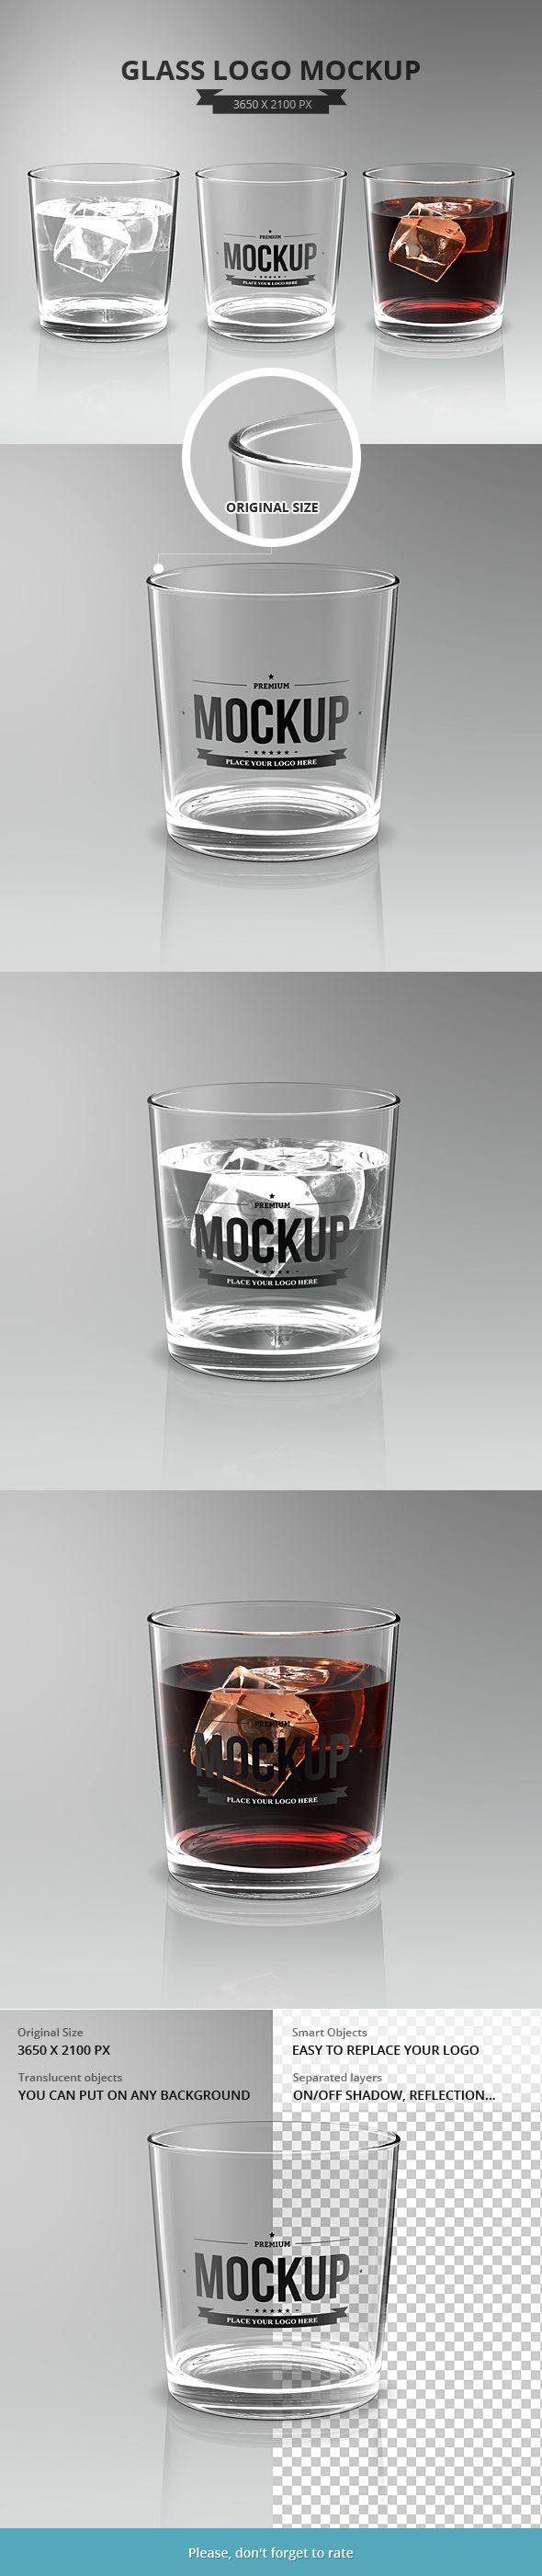 Drinking Glass Mockup on Behance